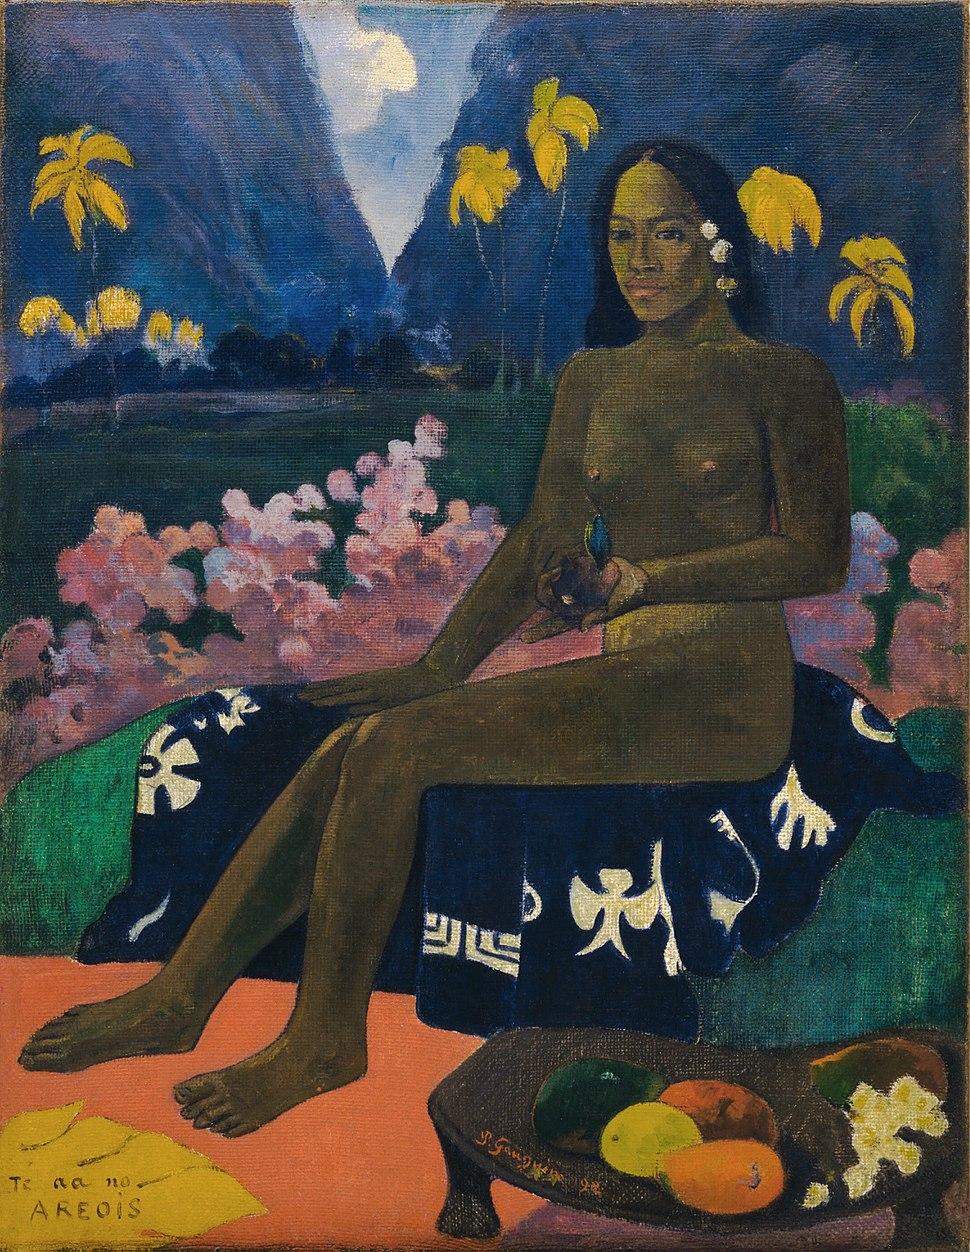 Paul Gauguin - Te aa no areois - Google Art Project